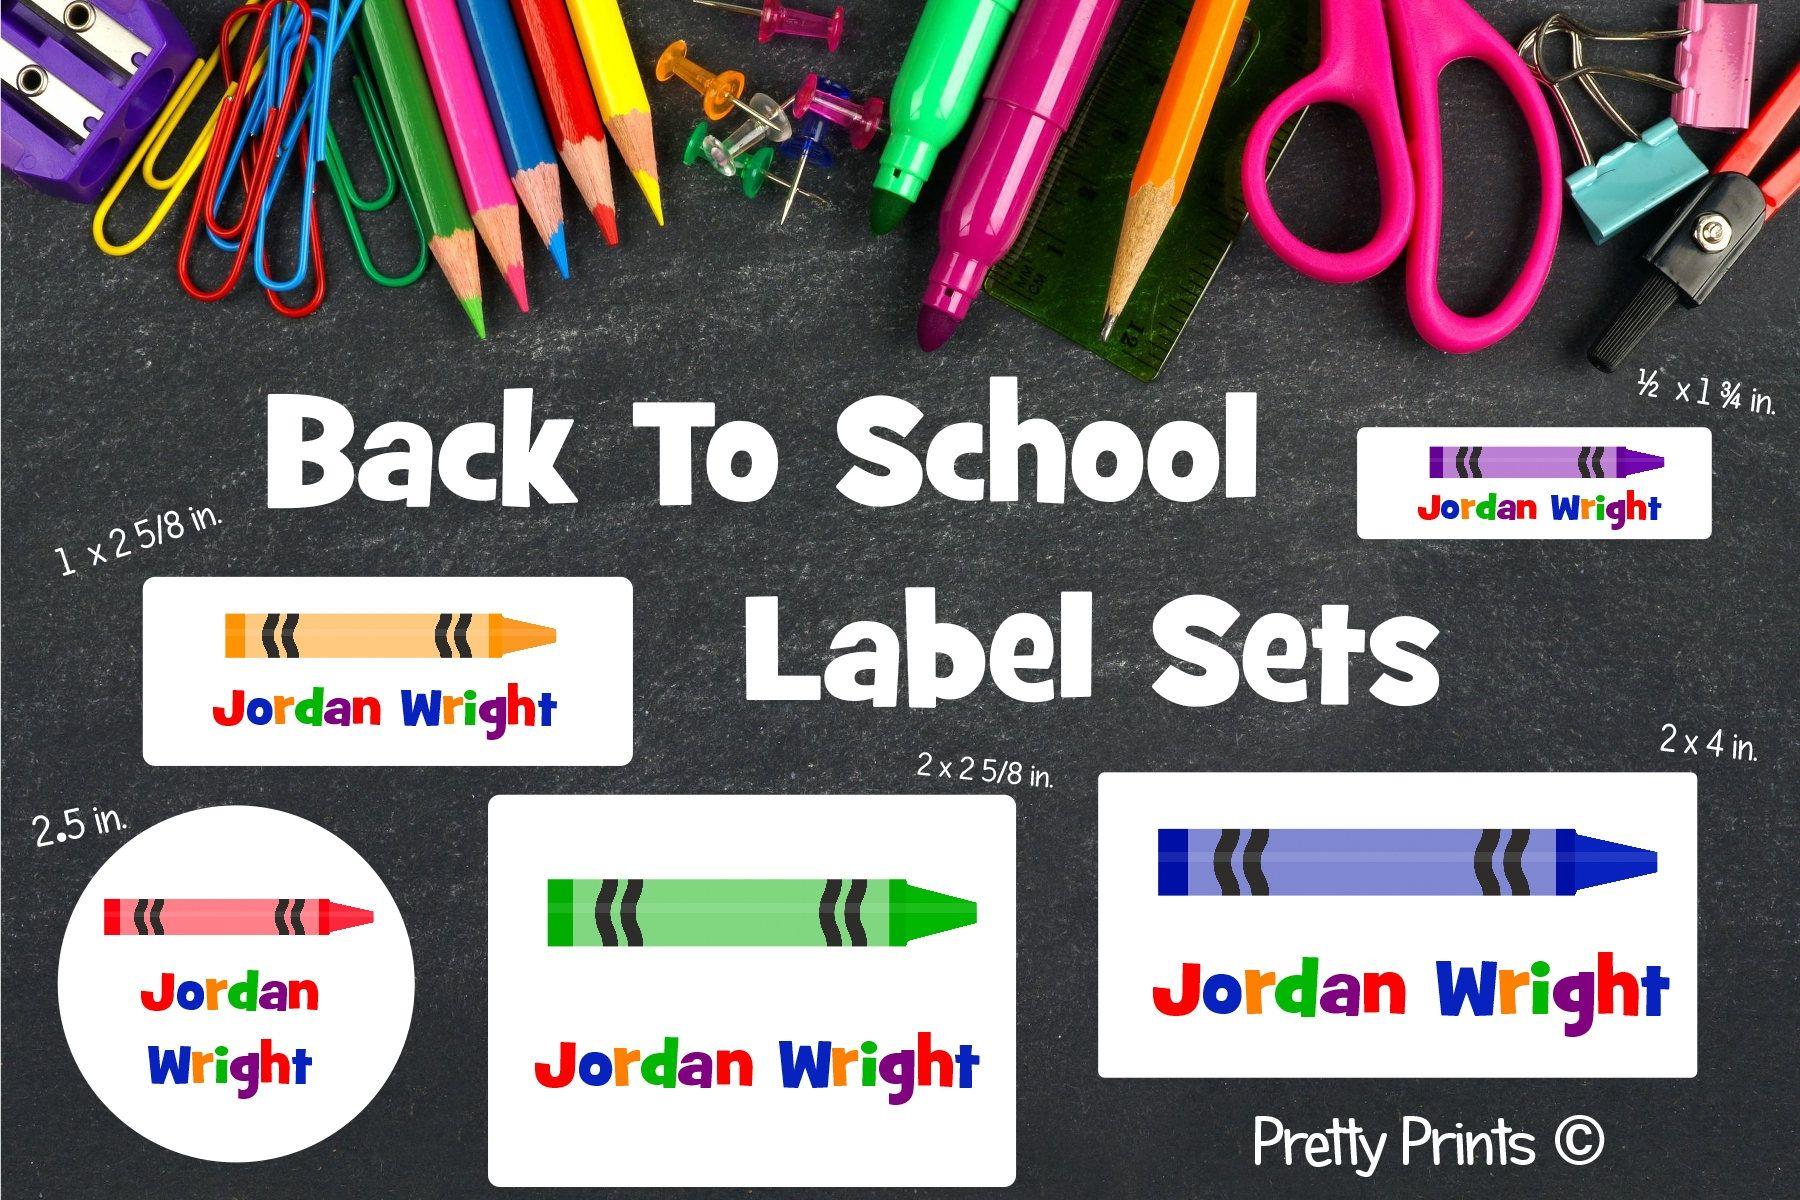 School labels back to school label set personalized stickers personalized labels school supply labels crayon labels